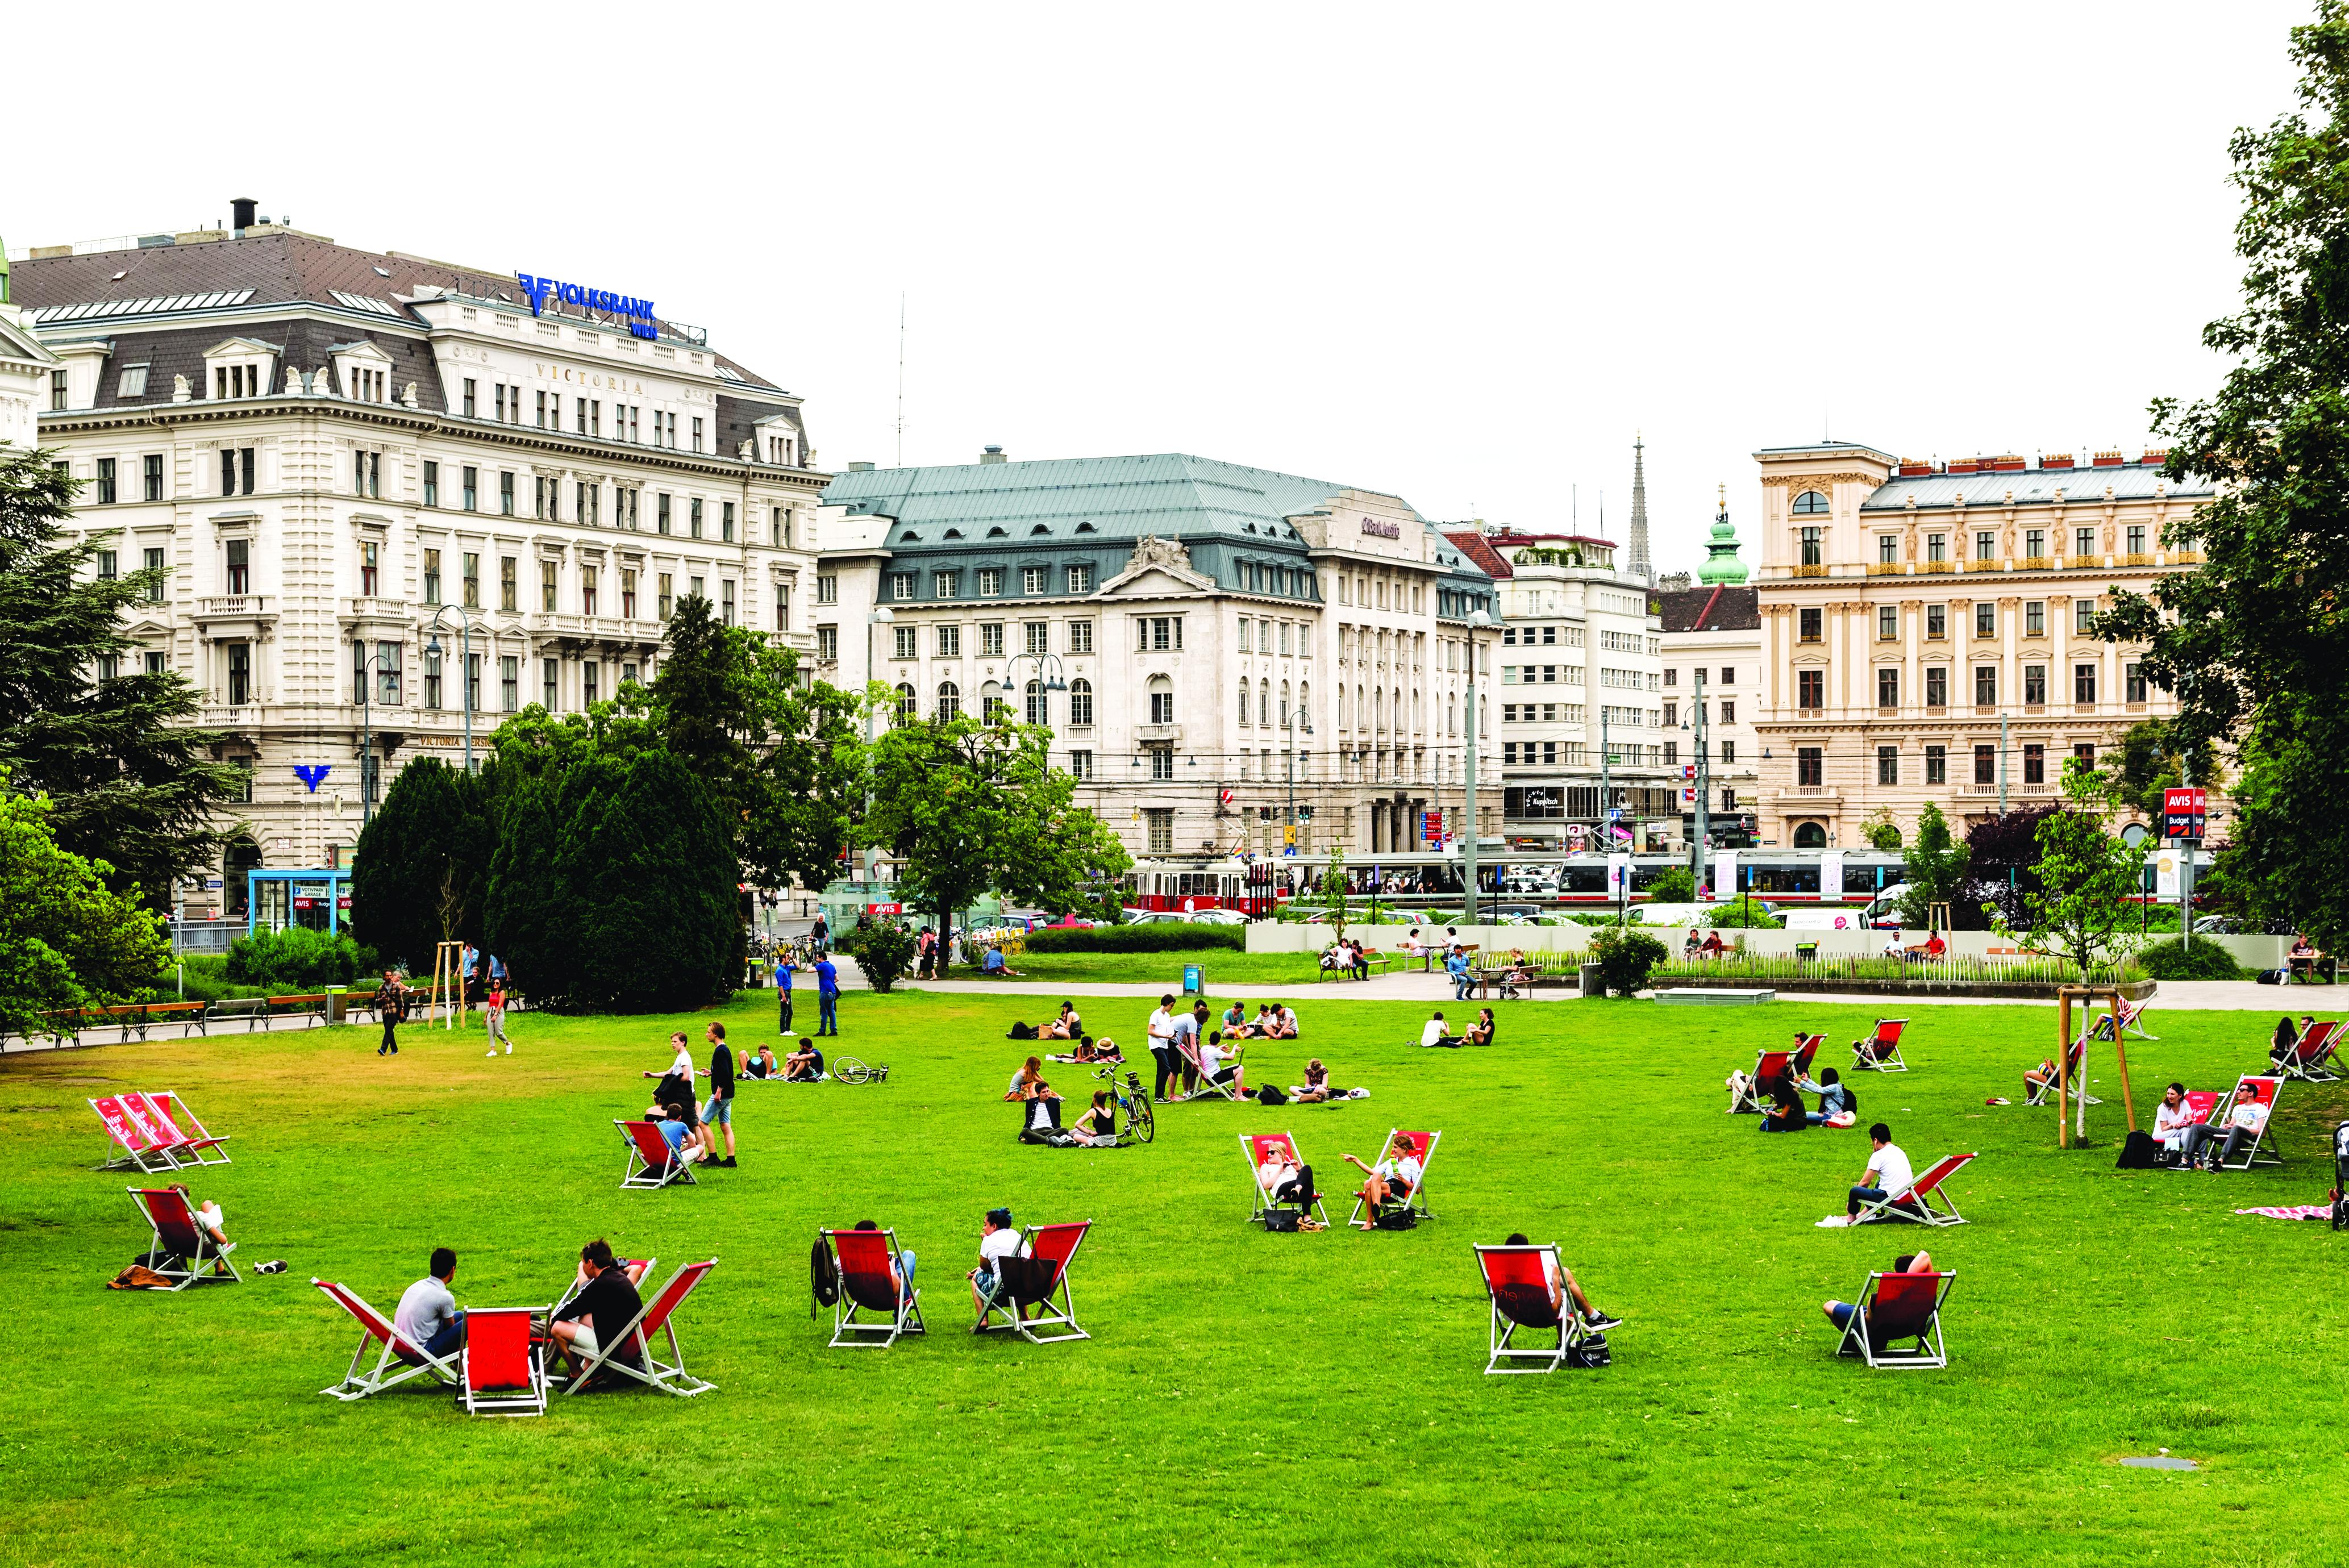 Praça Centro Historico, Viena